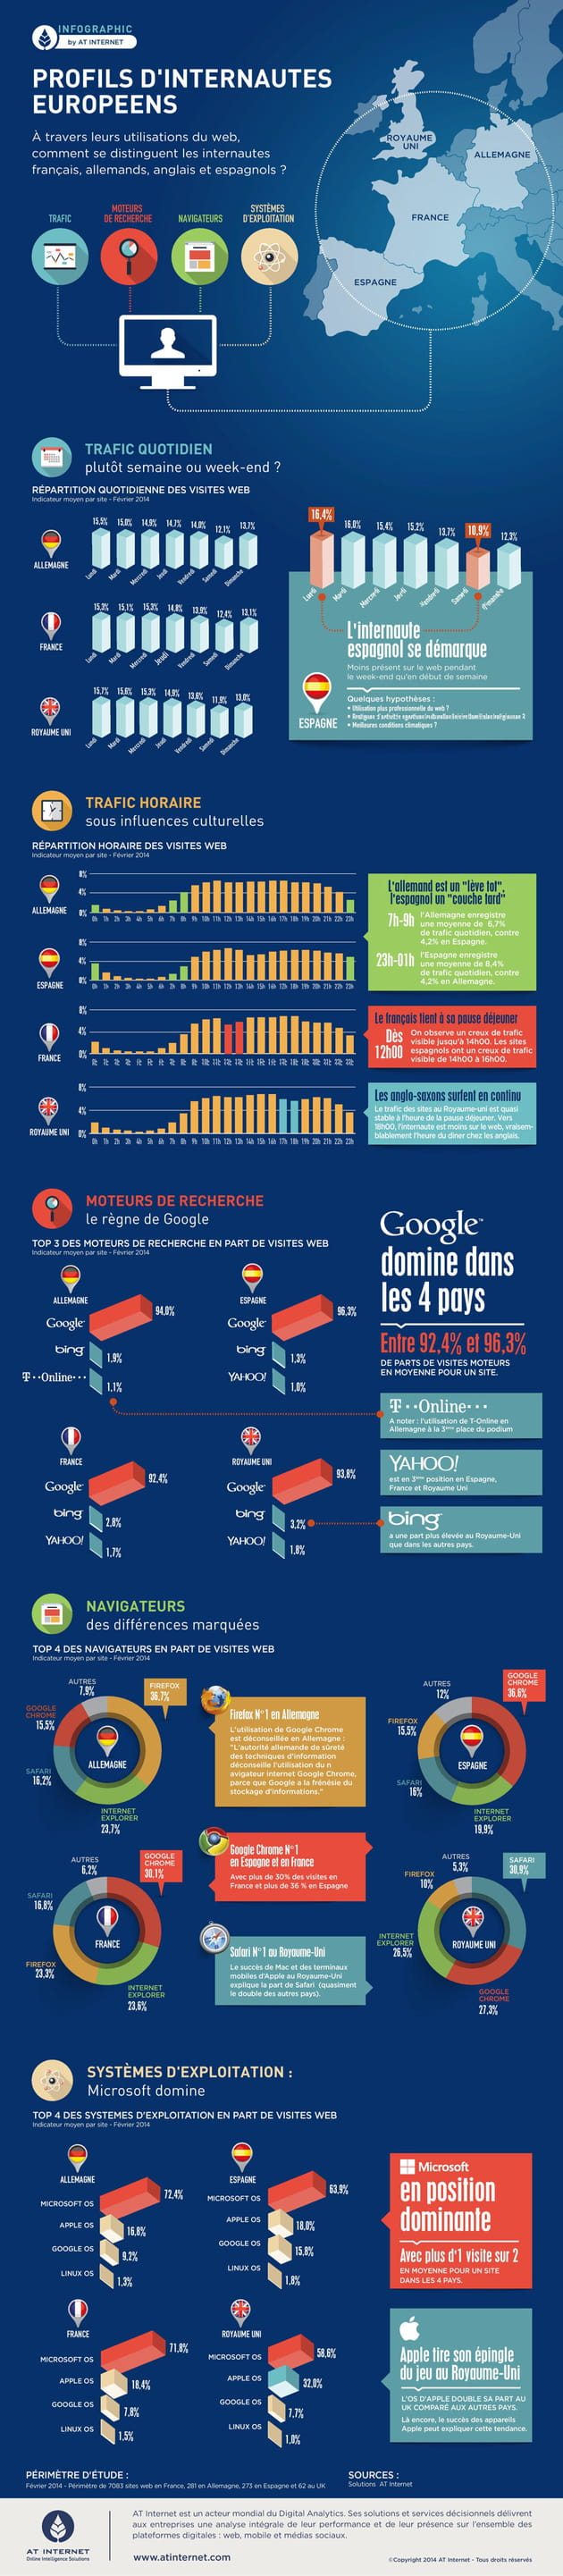 atinternet infographic